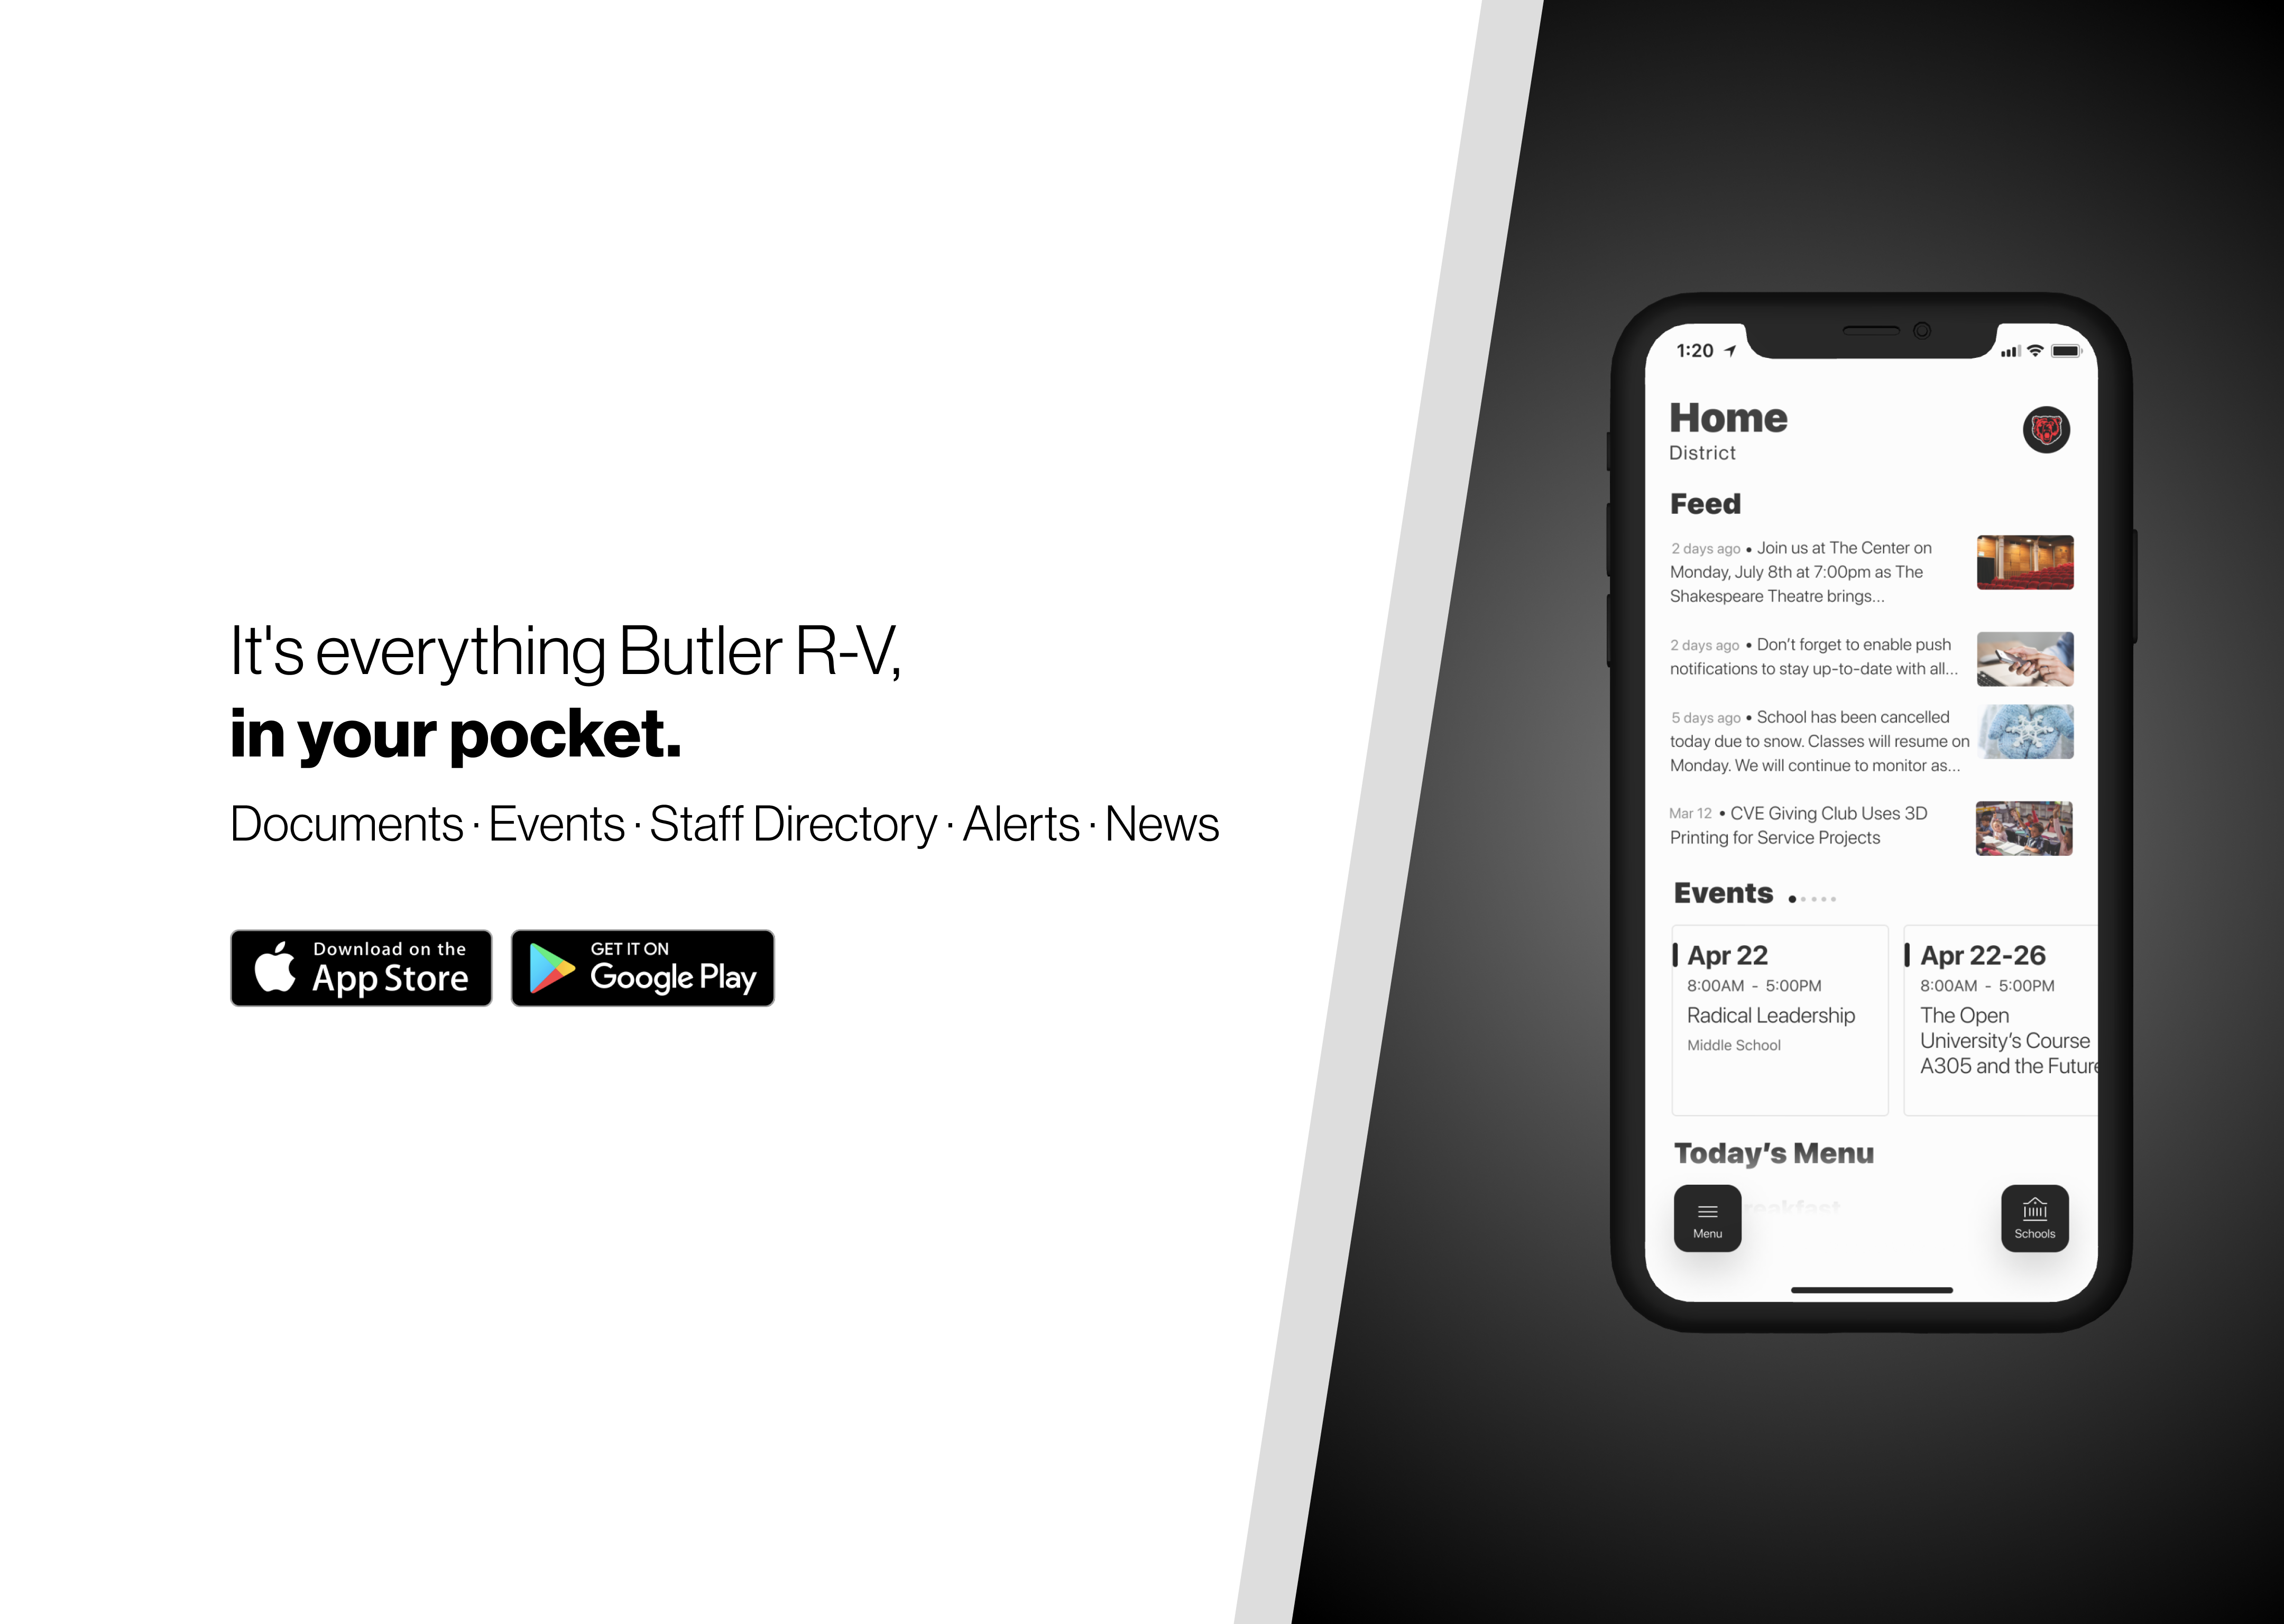 Mobile App picture